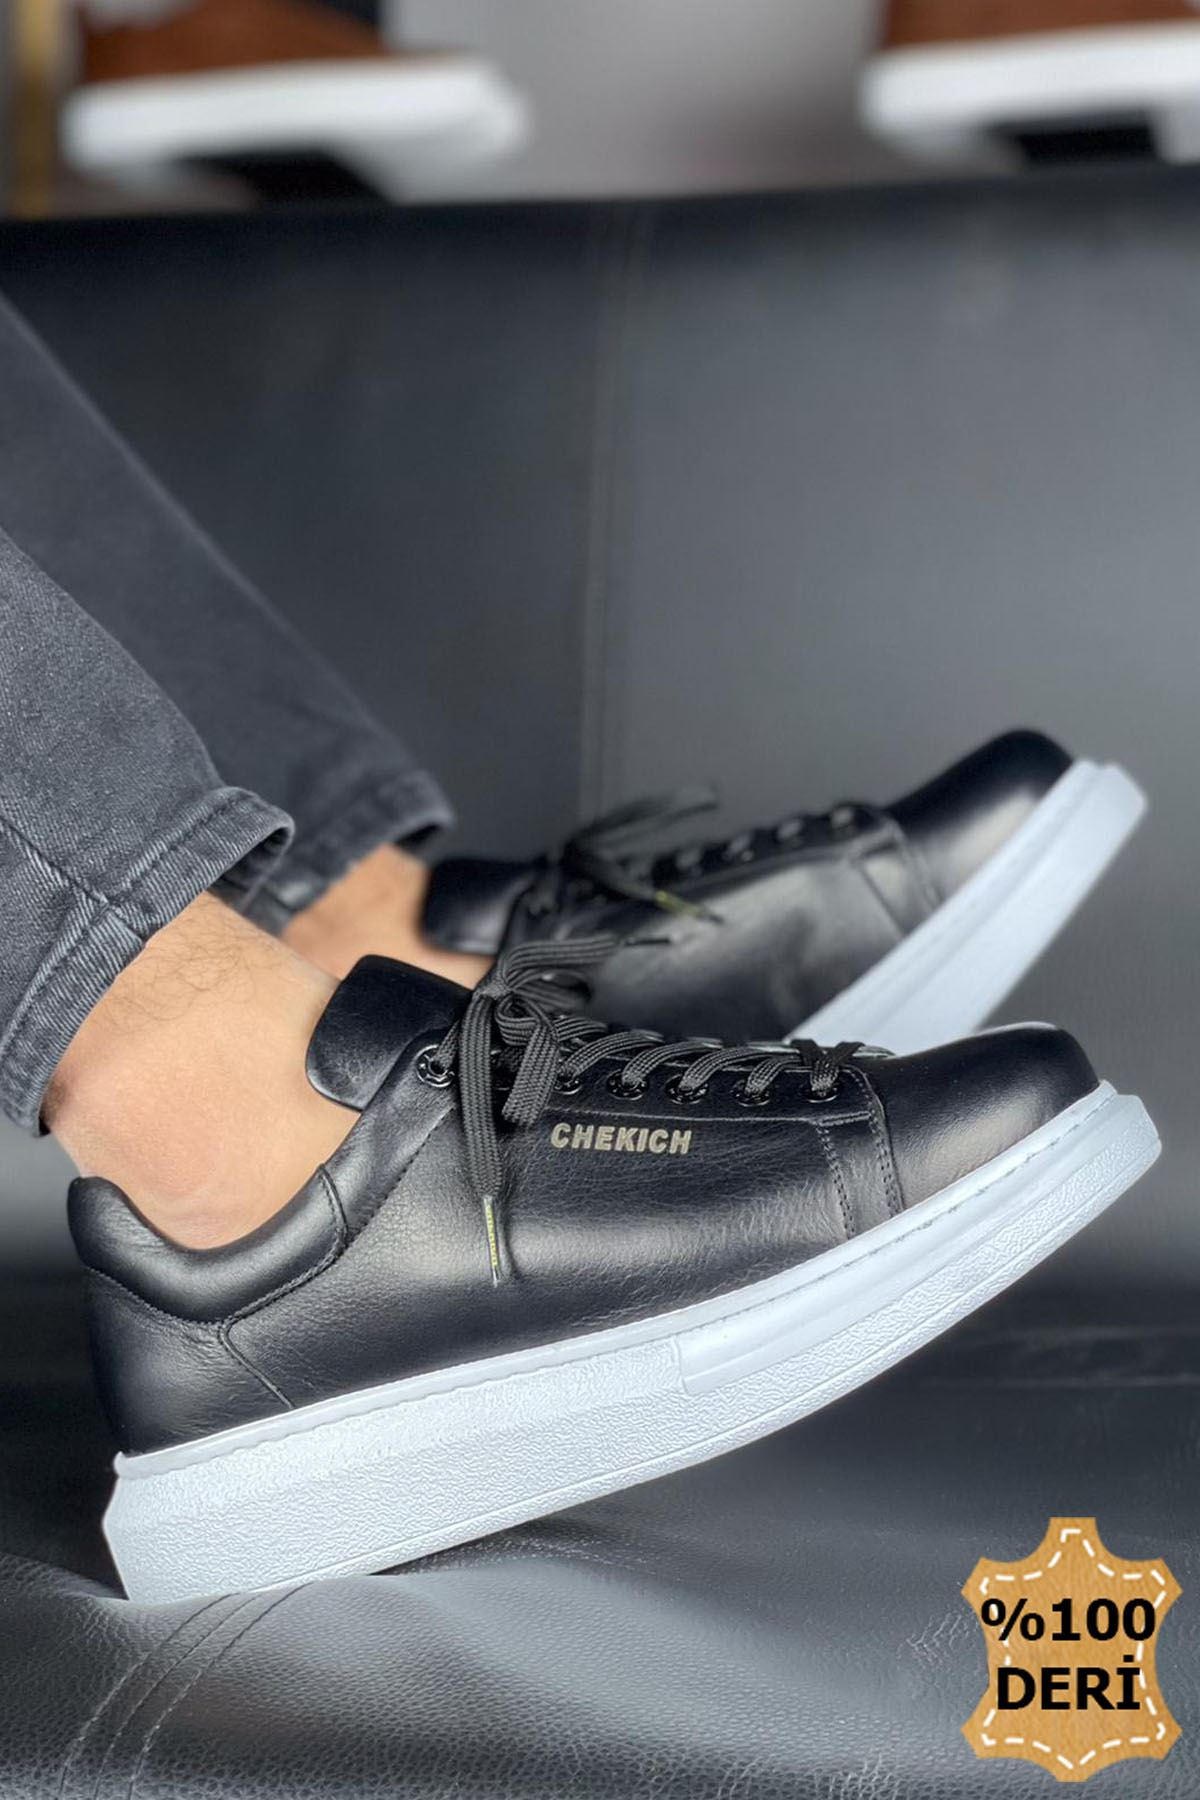 Chekich CH257 BT Hakiki Deri Erkek Ayakkabı SIYAH